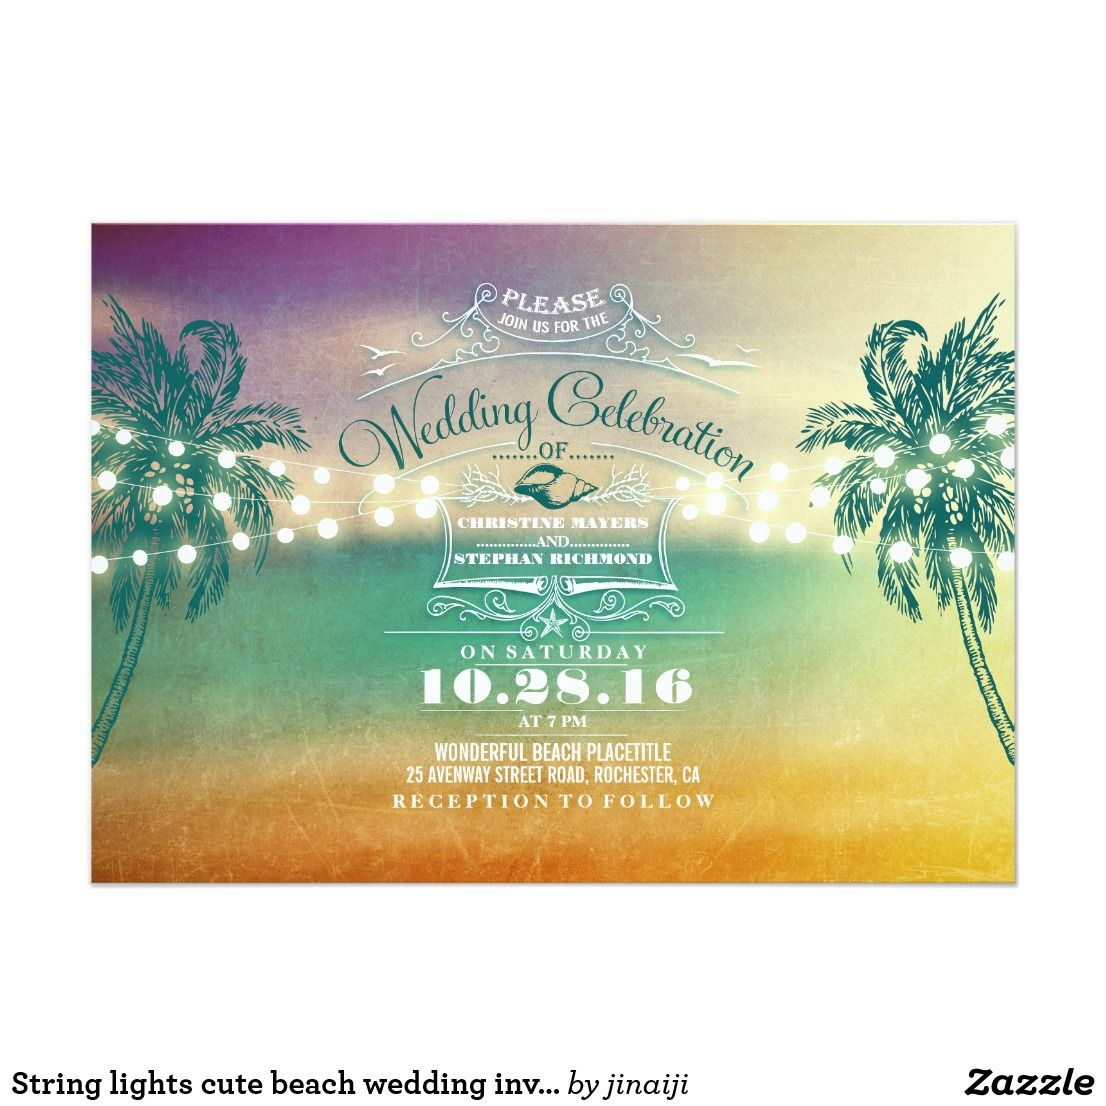 String lights cute beach wedding invitations | Beach wedding ...